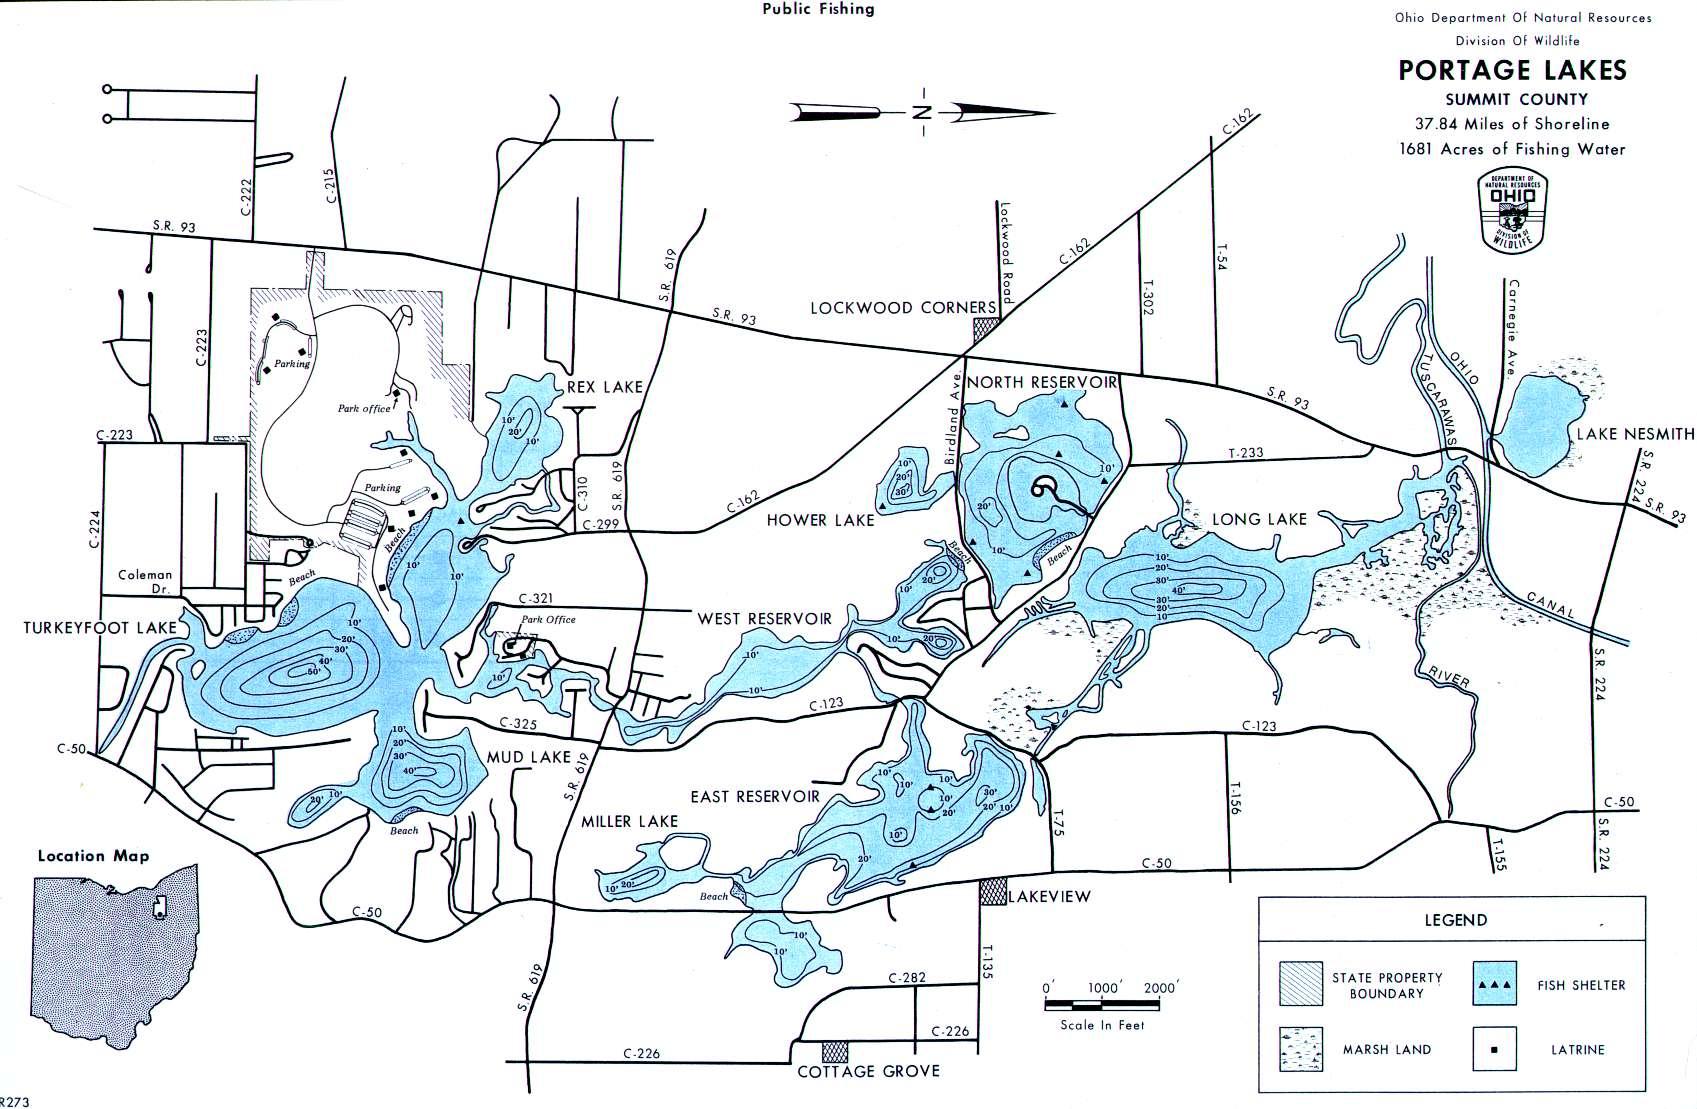 Portage Lakes Fishing Map, OH - GoFishOhio